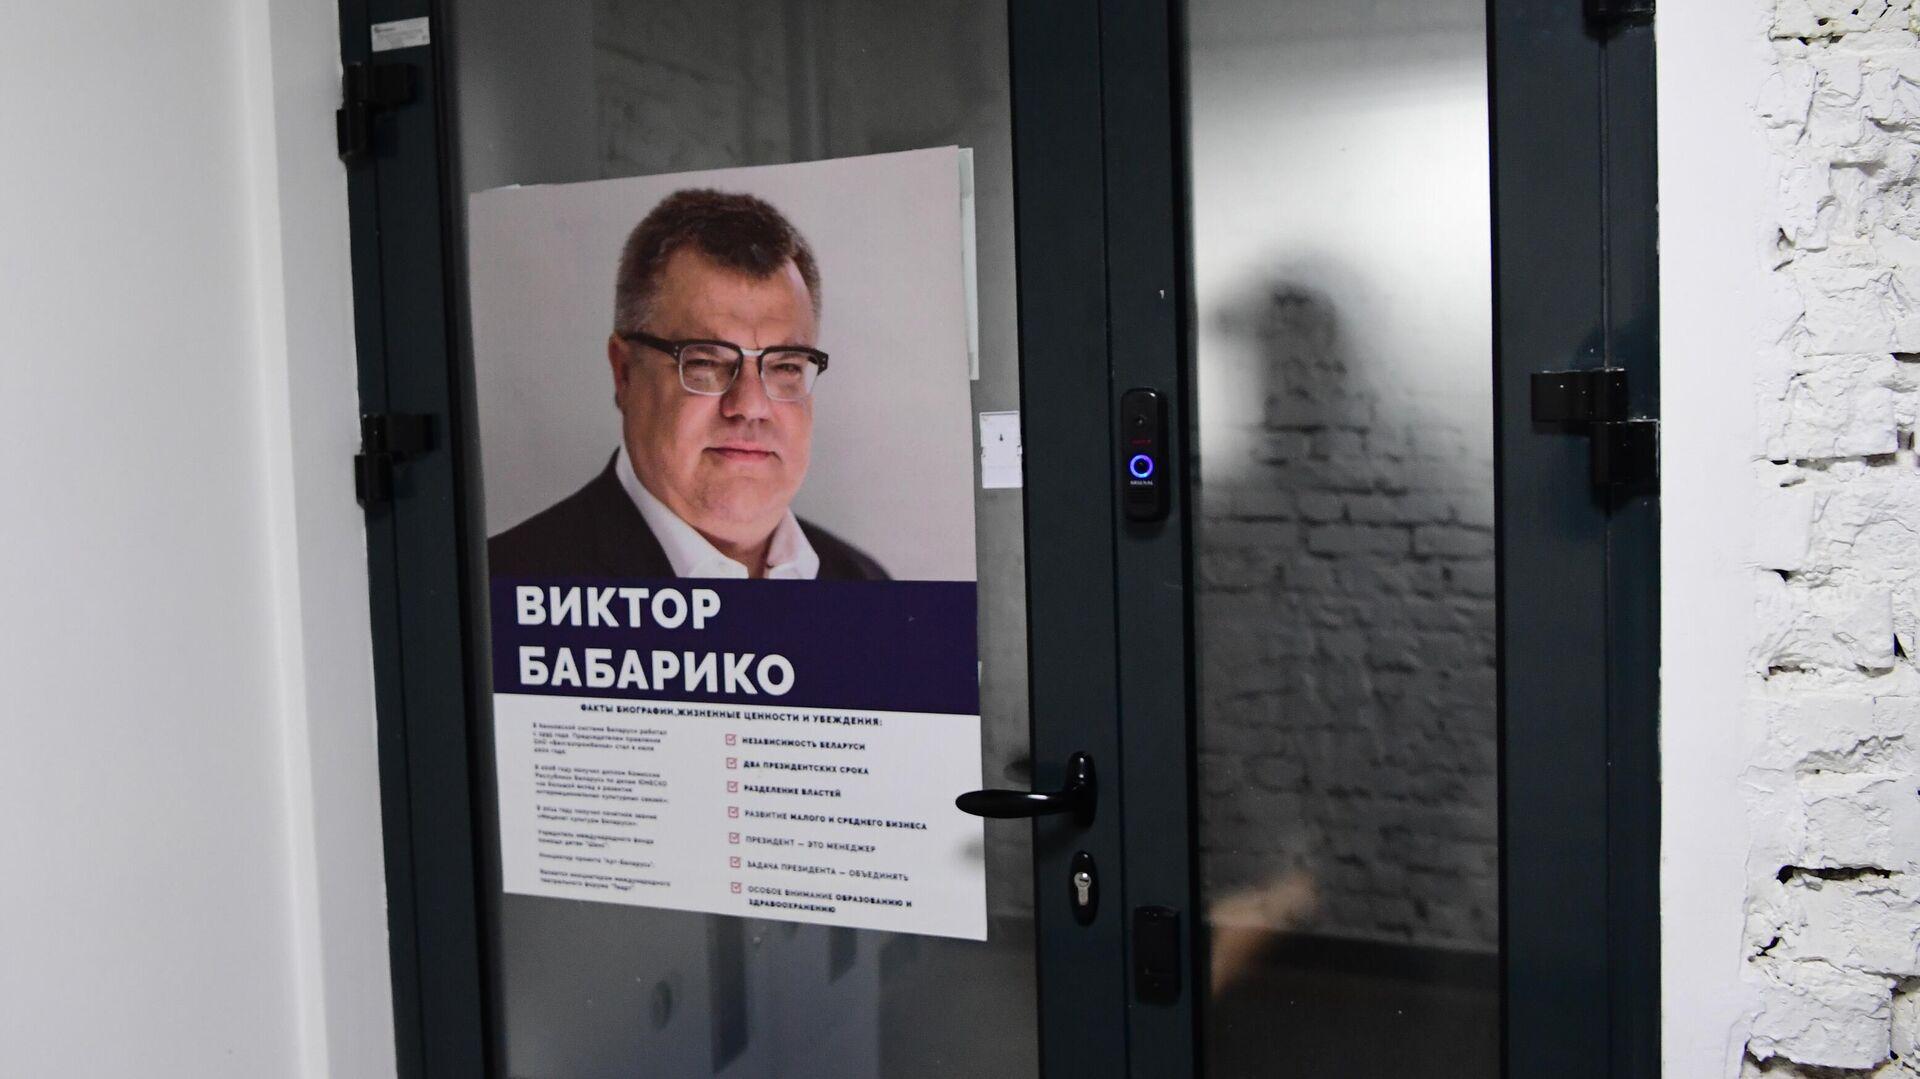 В двери входа в штаб Виктора Бабарико в Минске - РИА Новости, 1920, 09.06.2021